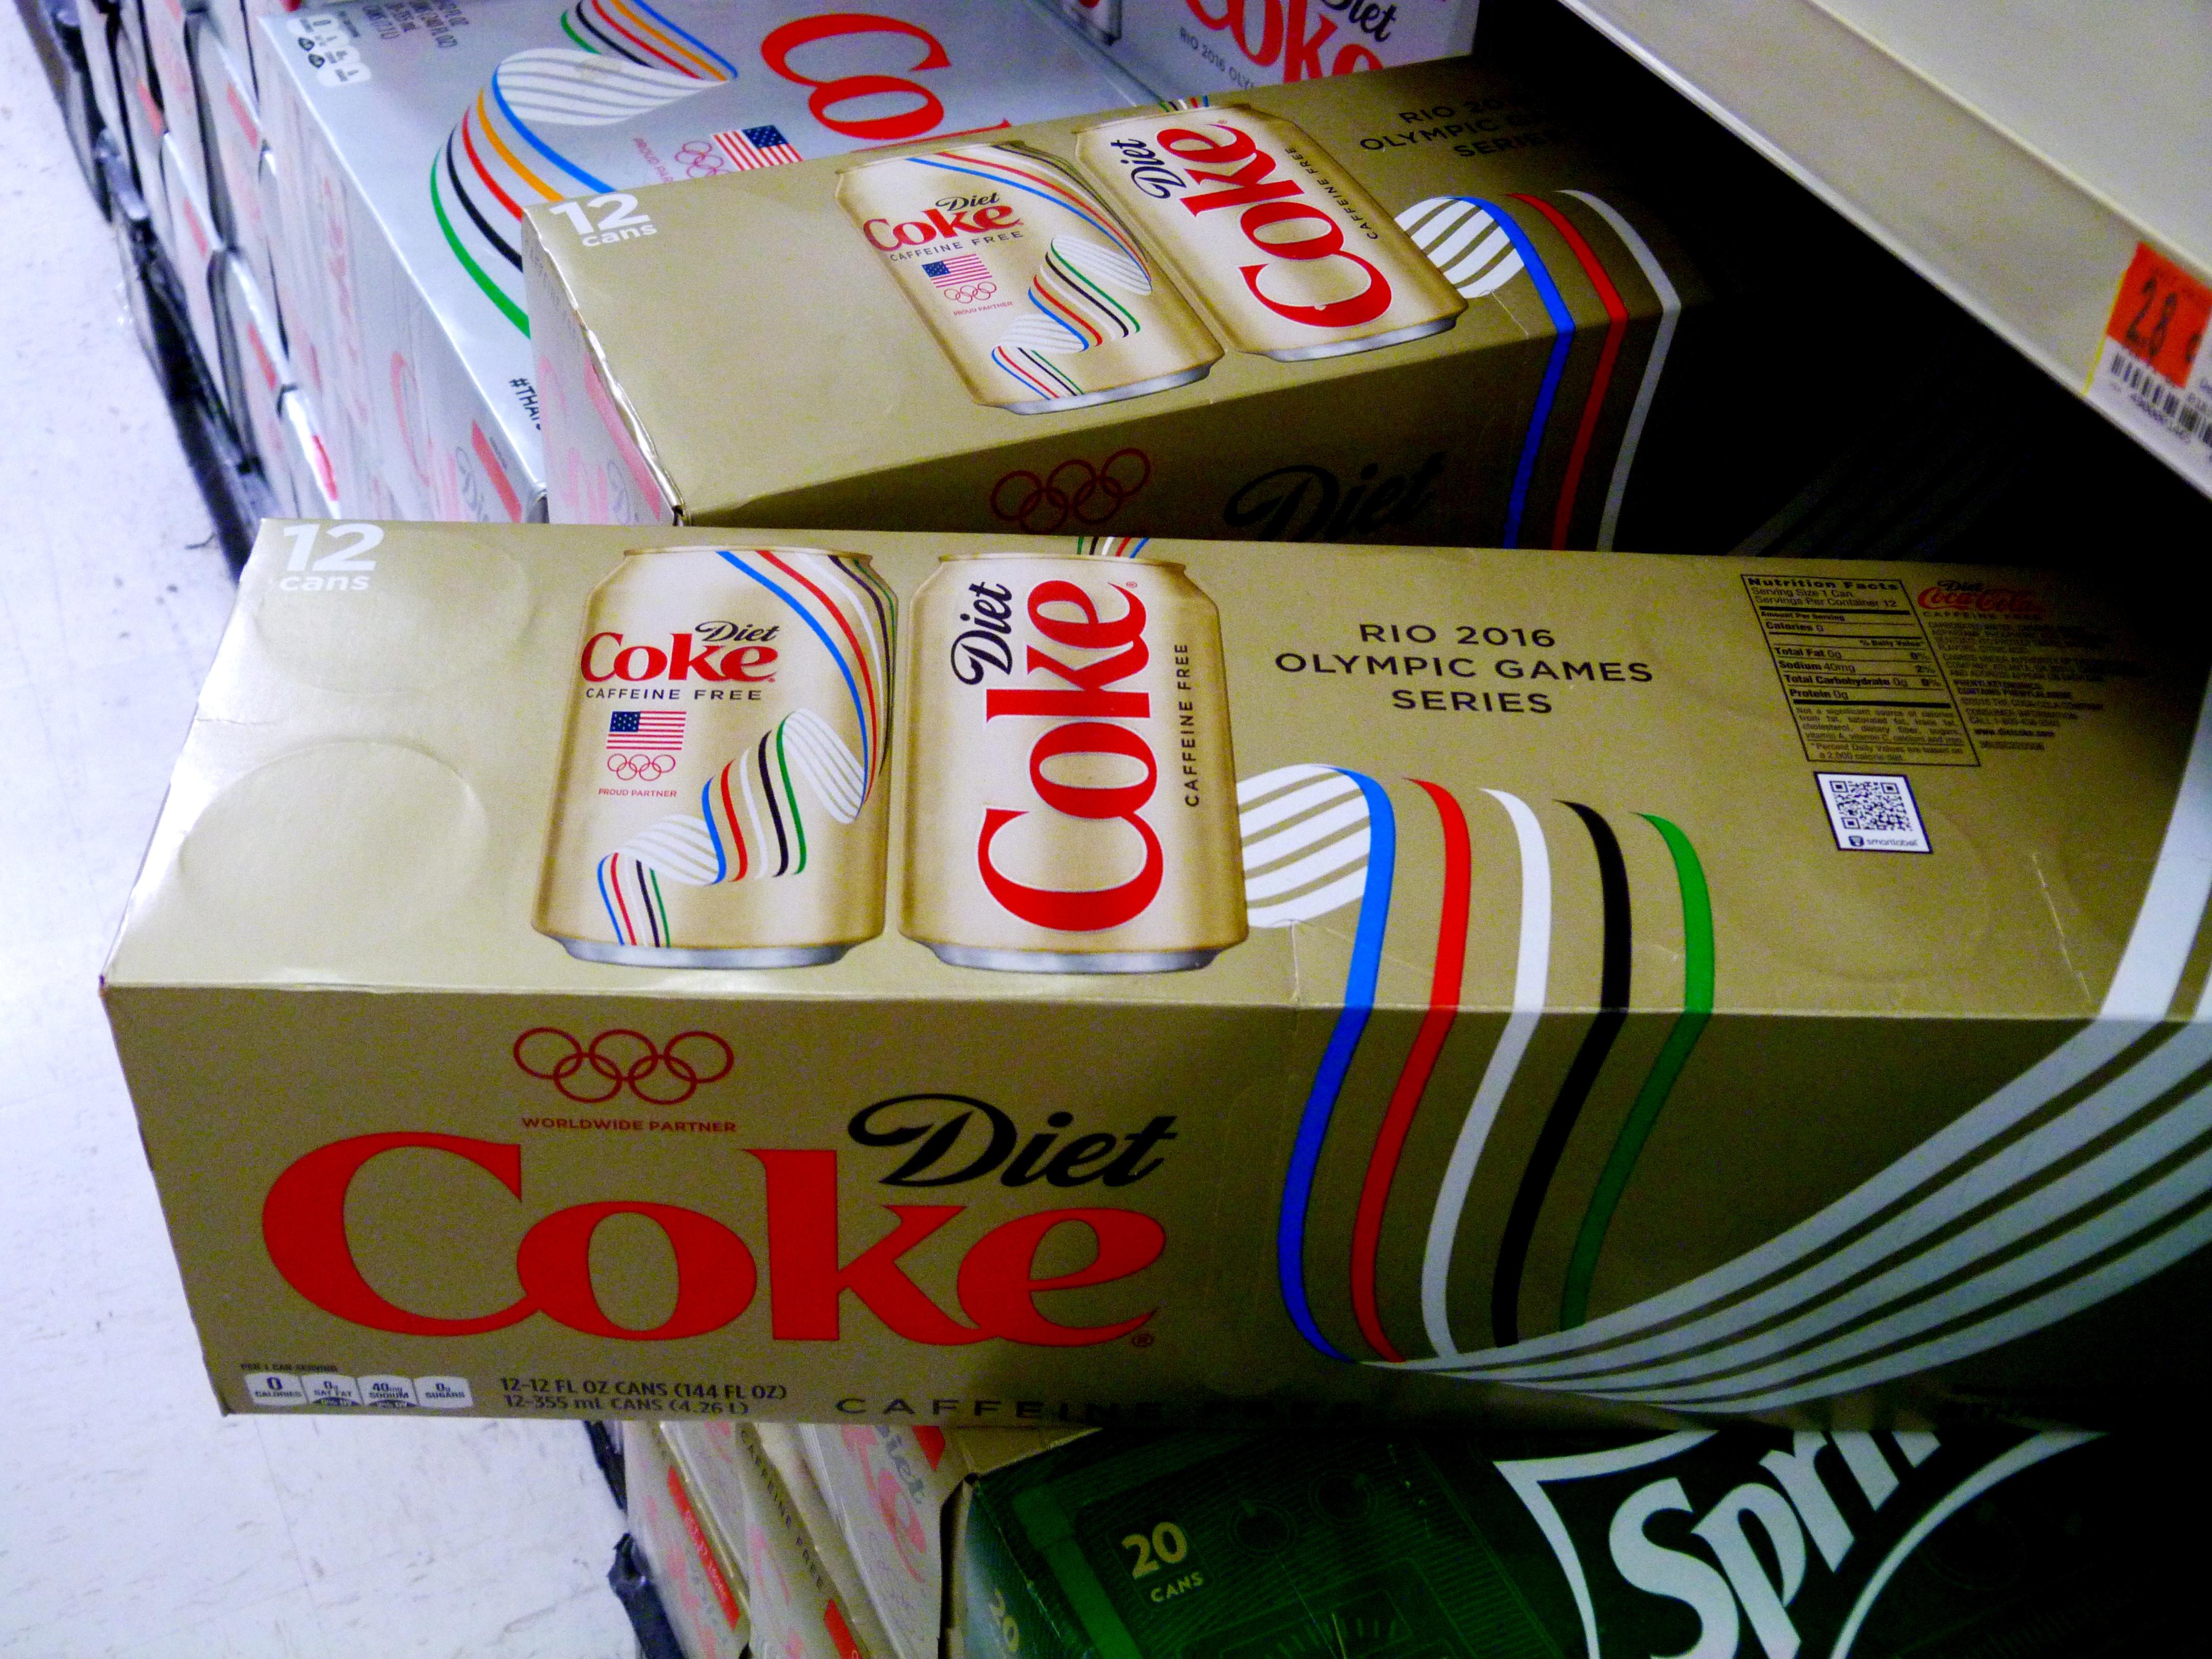 Rio Olympics Coca-Cola